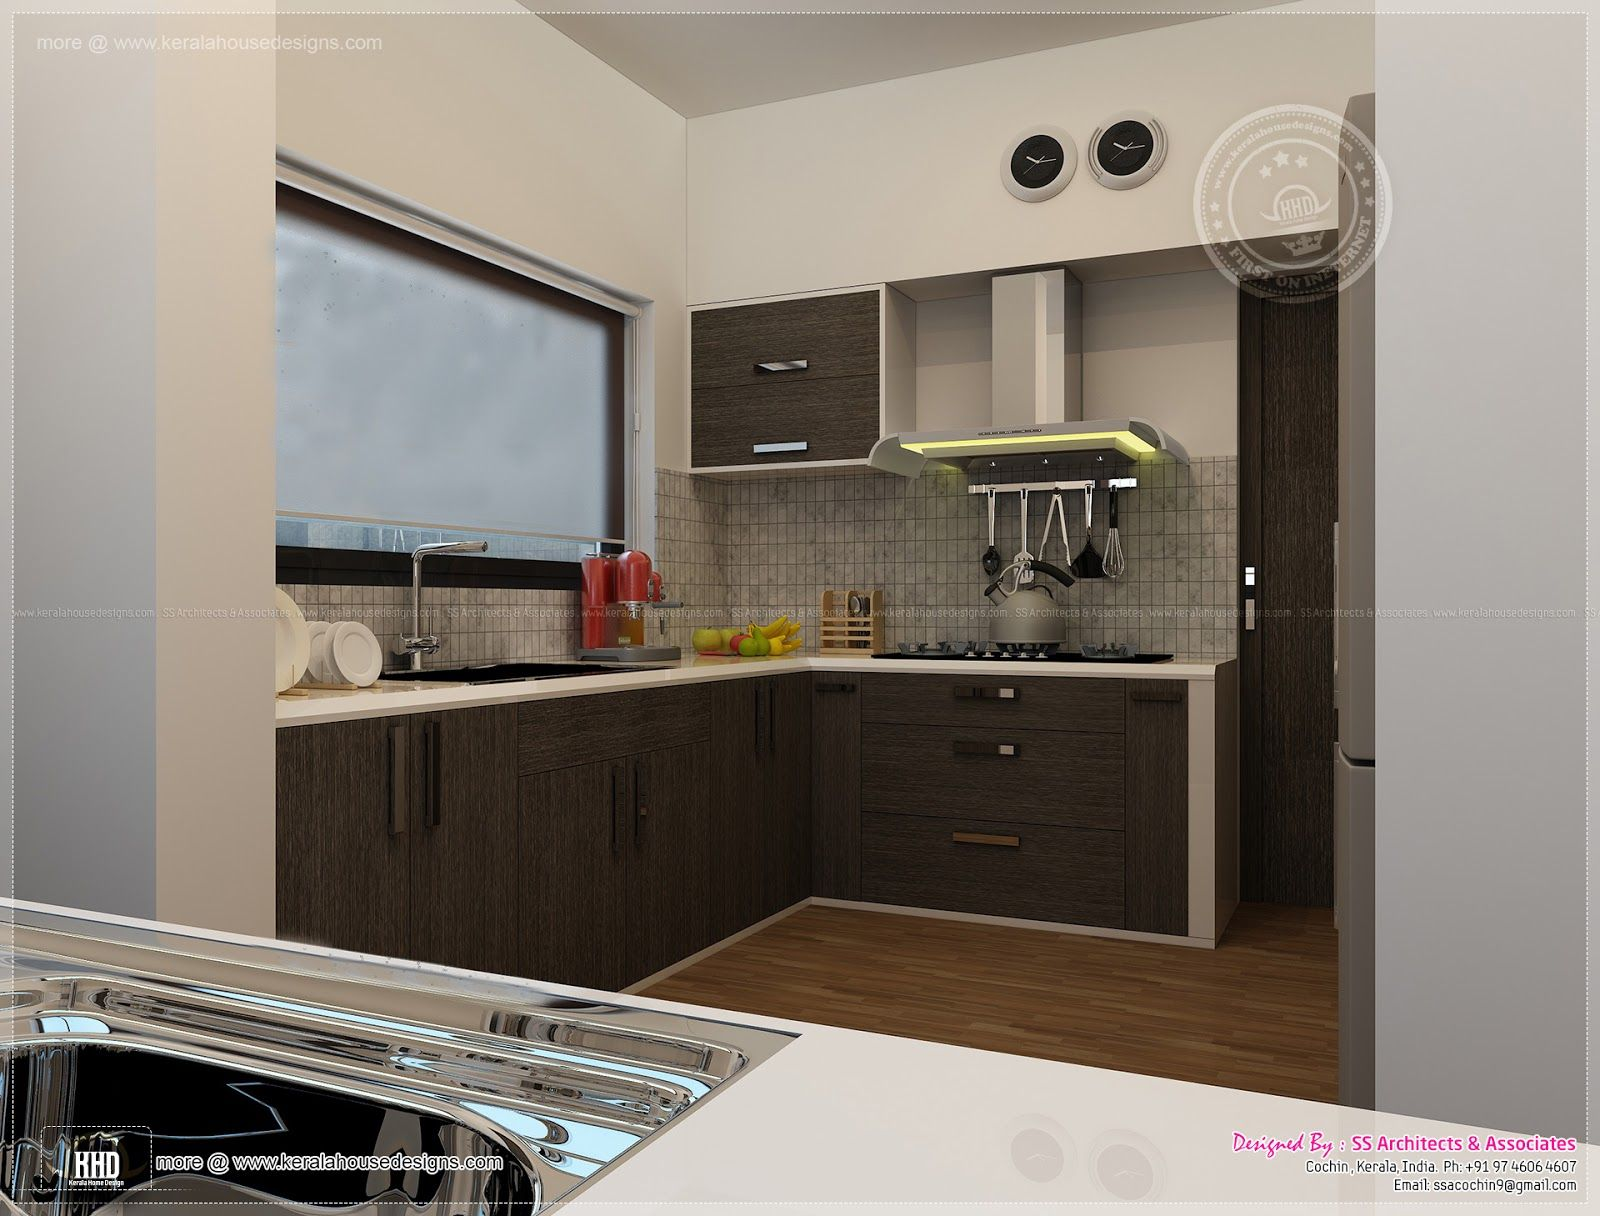 Pin By Master Digital Lte On Byt Inspirace Farmhouse Bathroom Decor Modern Kitchen Design Interior Design Kitchen